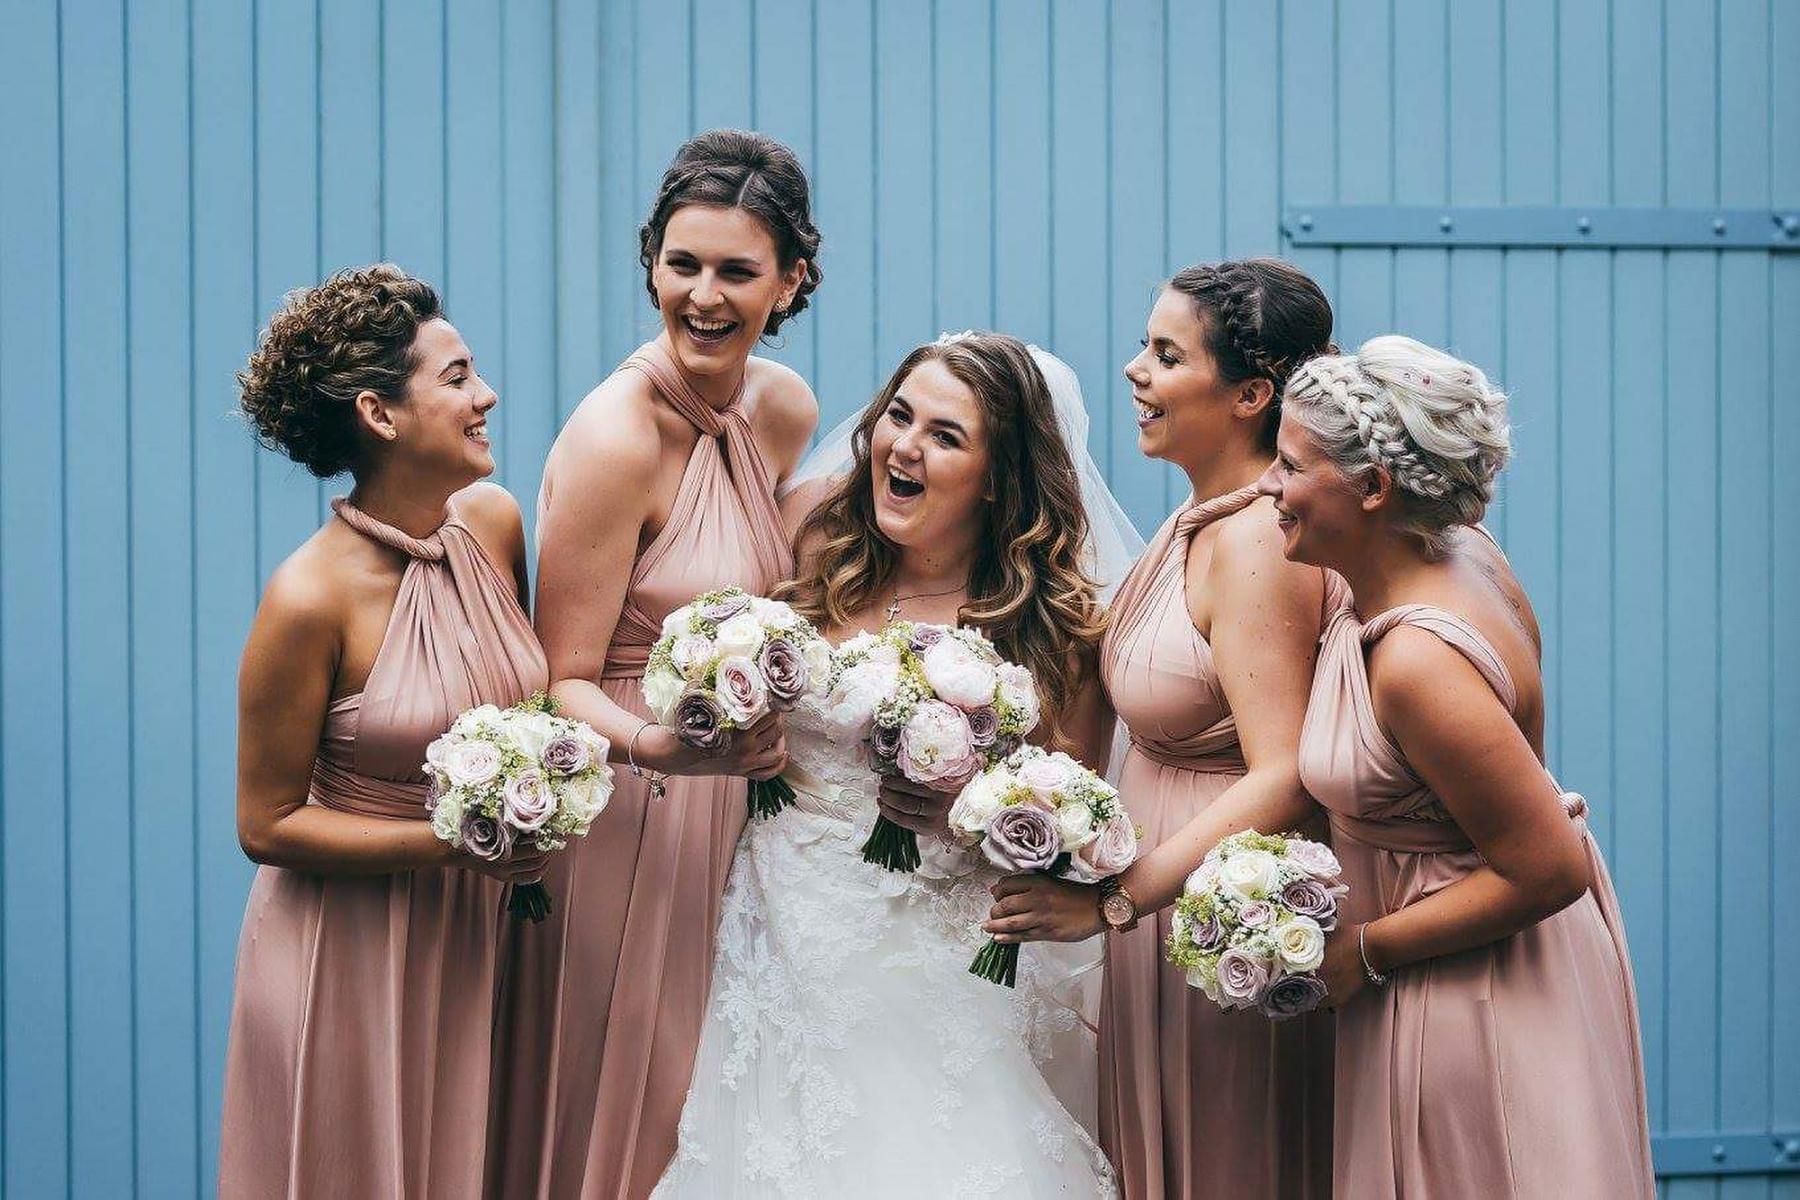 pendrell-hall-wedding-flowers-rugeley-florist-staffordshire-001